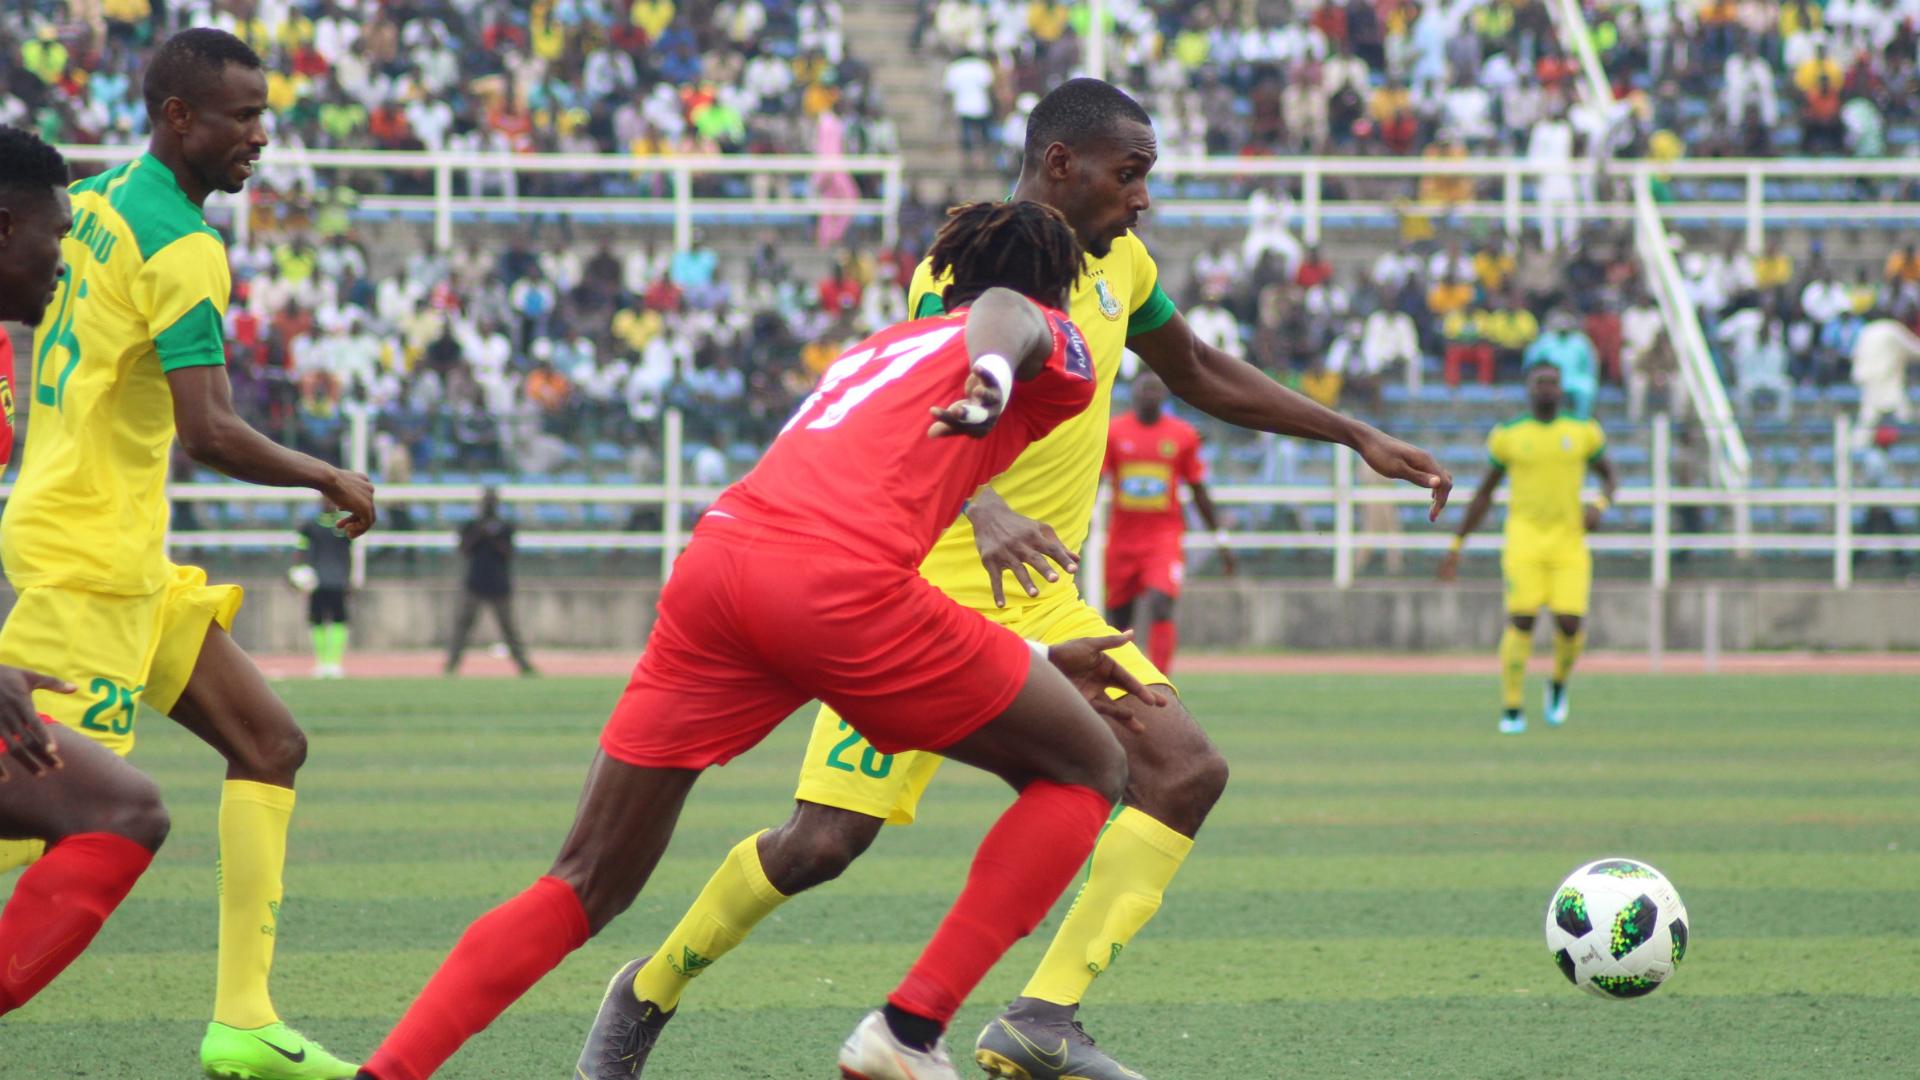 Asante Kotoko pip Ebusua Dwarfs in Ghana Premier League